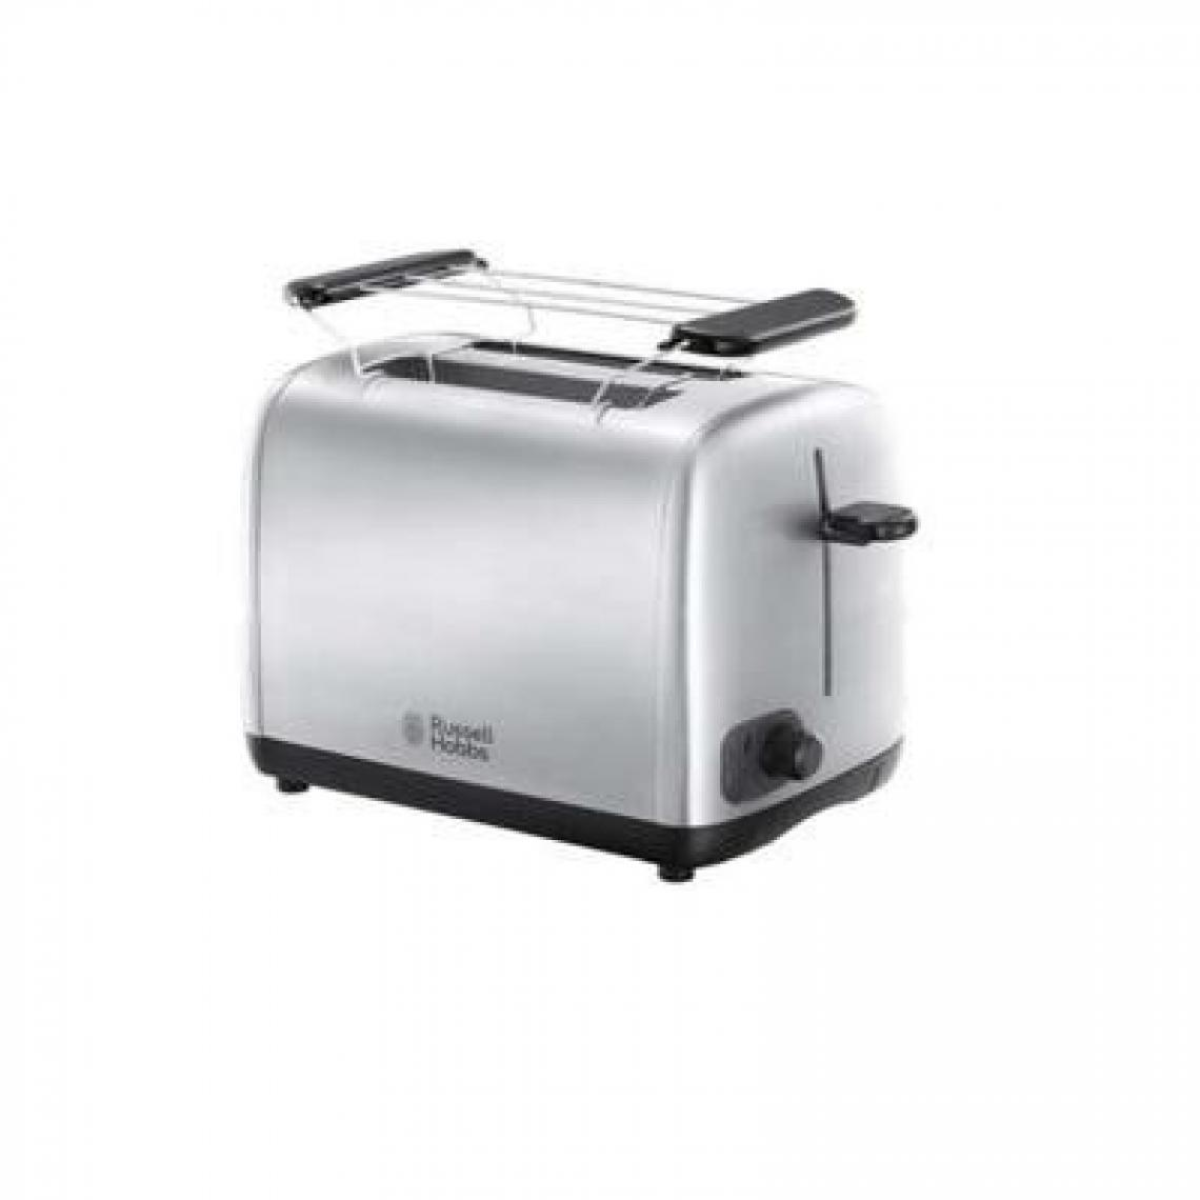 Russell Hobbs Toaster Adventure - 24080-56 - Acier inox brossé